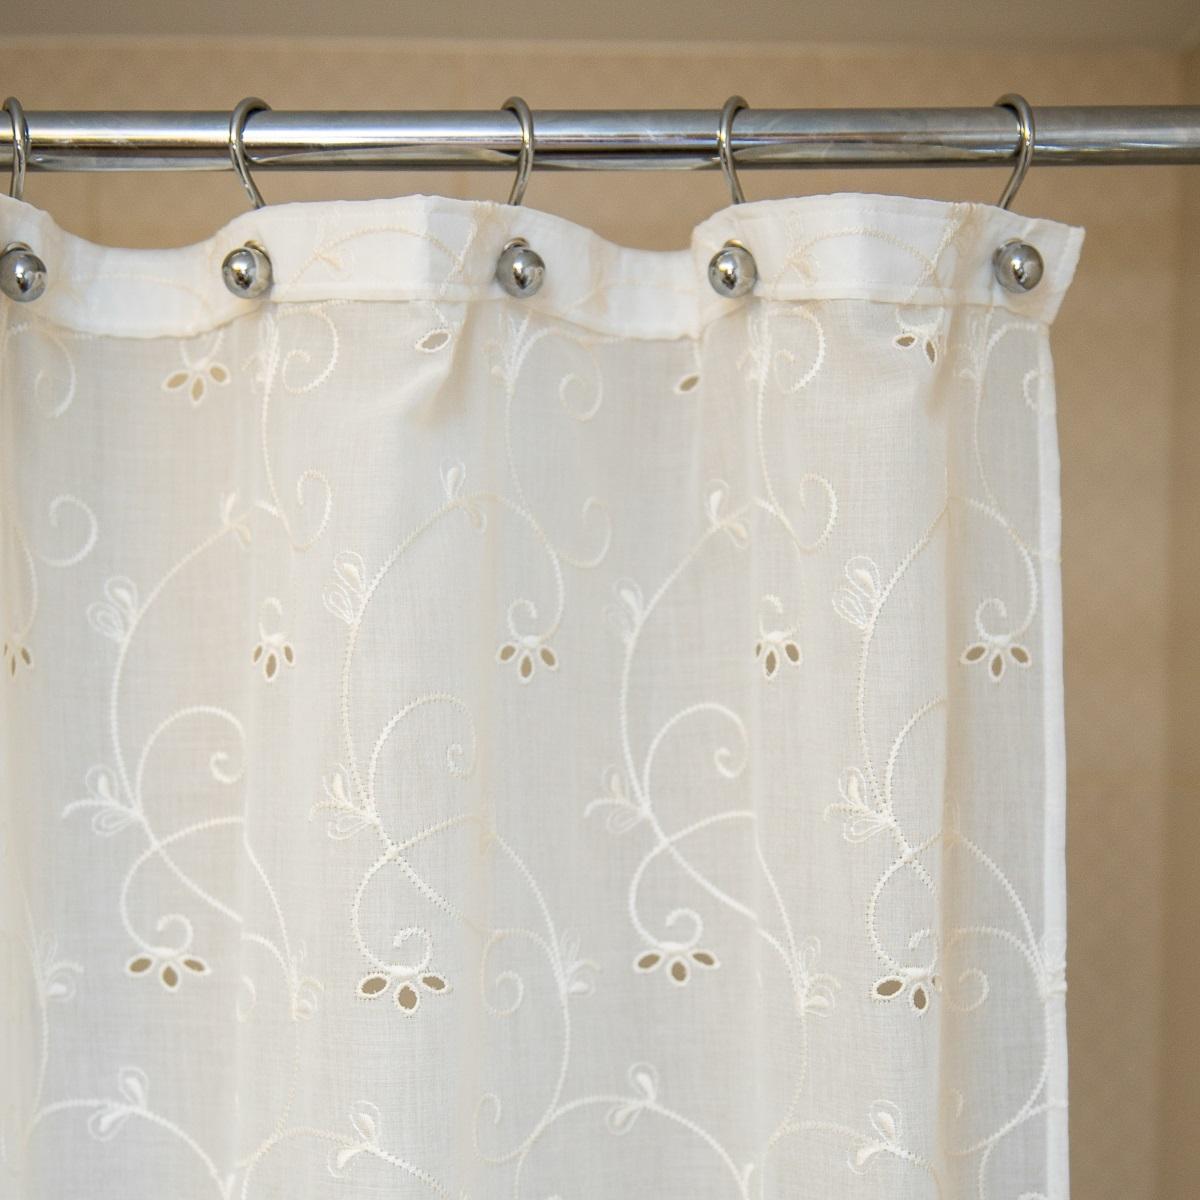 Шторки Шторка для ванной 200х300 Arti-Deco Embroidery 2803 elitnaya-shtorka-dlya-vannoy-300h200-embrodery-2803-ot-arti-deco-ispaniya.jpg